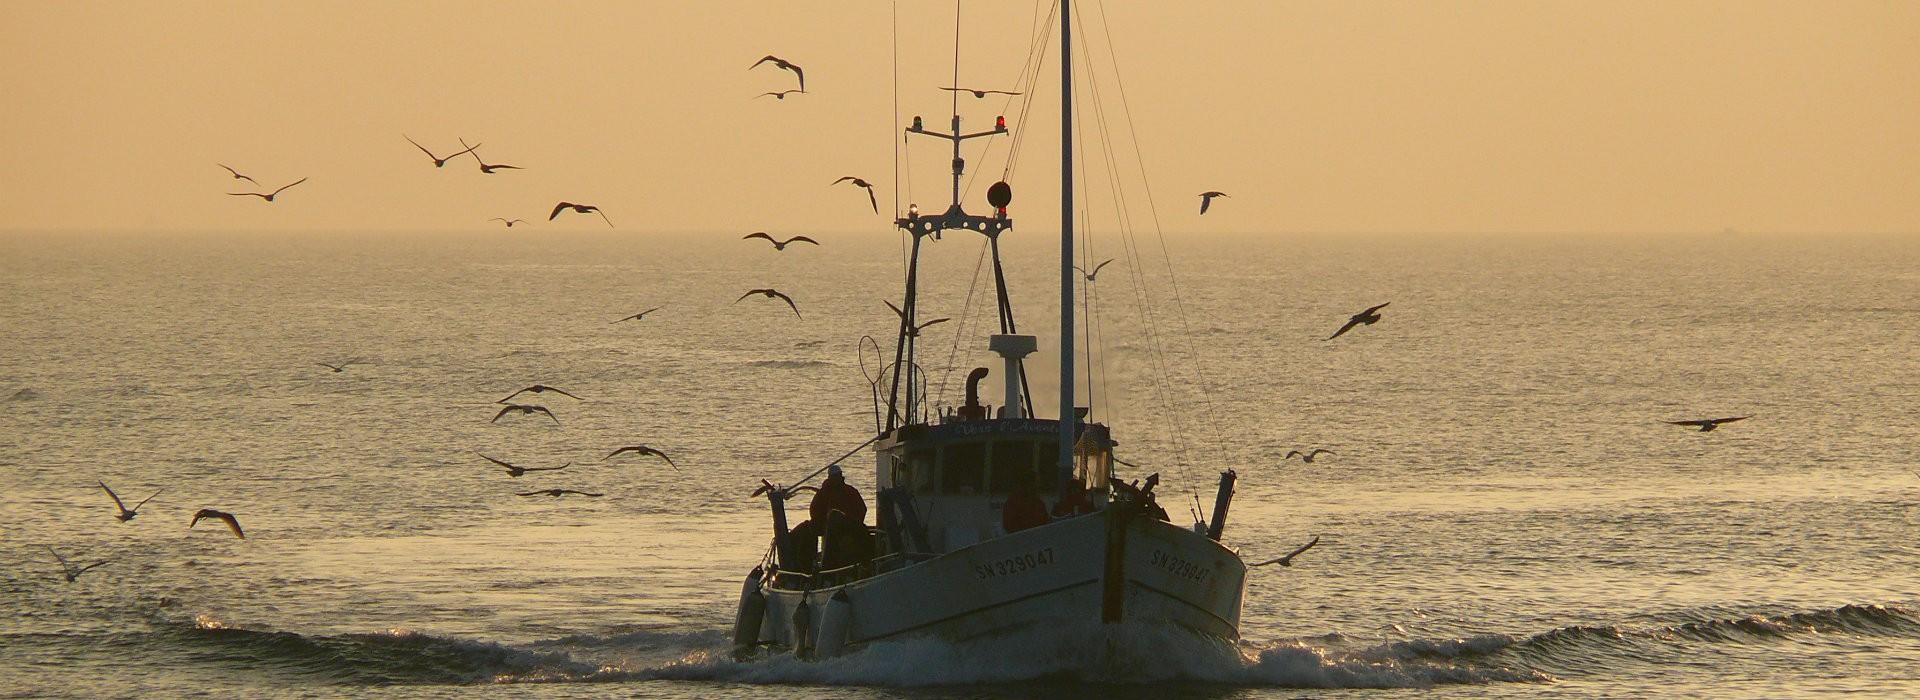 Sea fishing trips - Bruno Schoch